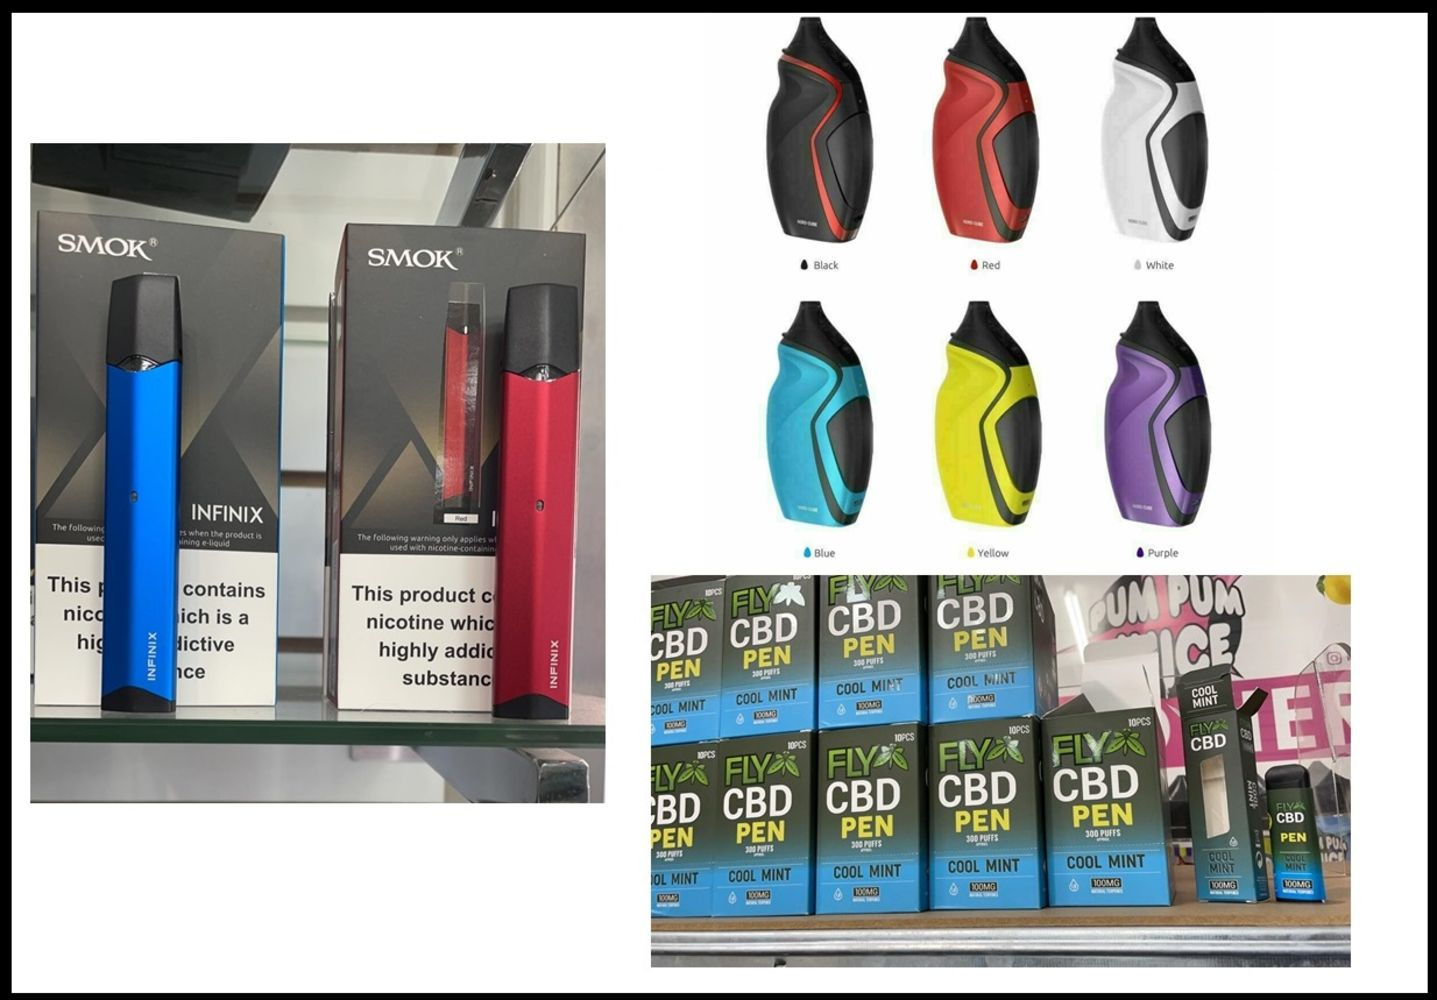 CLEARANCE VAPE PRODUCTS. ALL BRAND NEW STOCK. CBD Pens, Smok Infinix Kits, Smok Nord Cube Kits, Over 600 Items